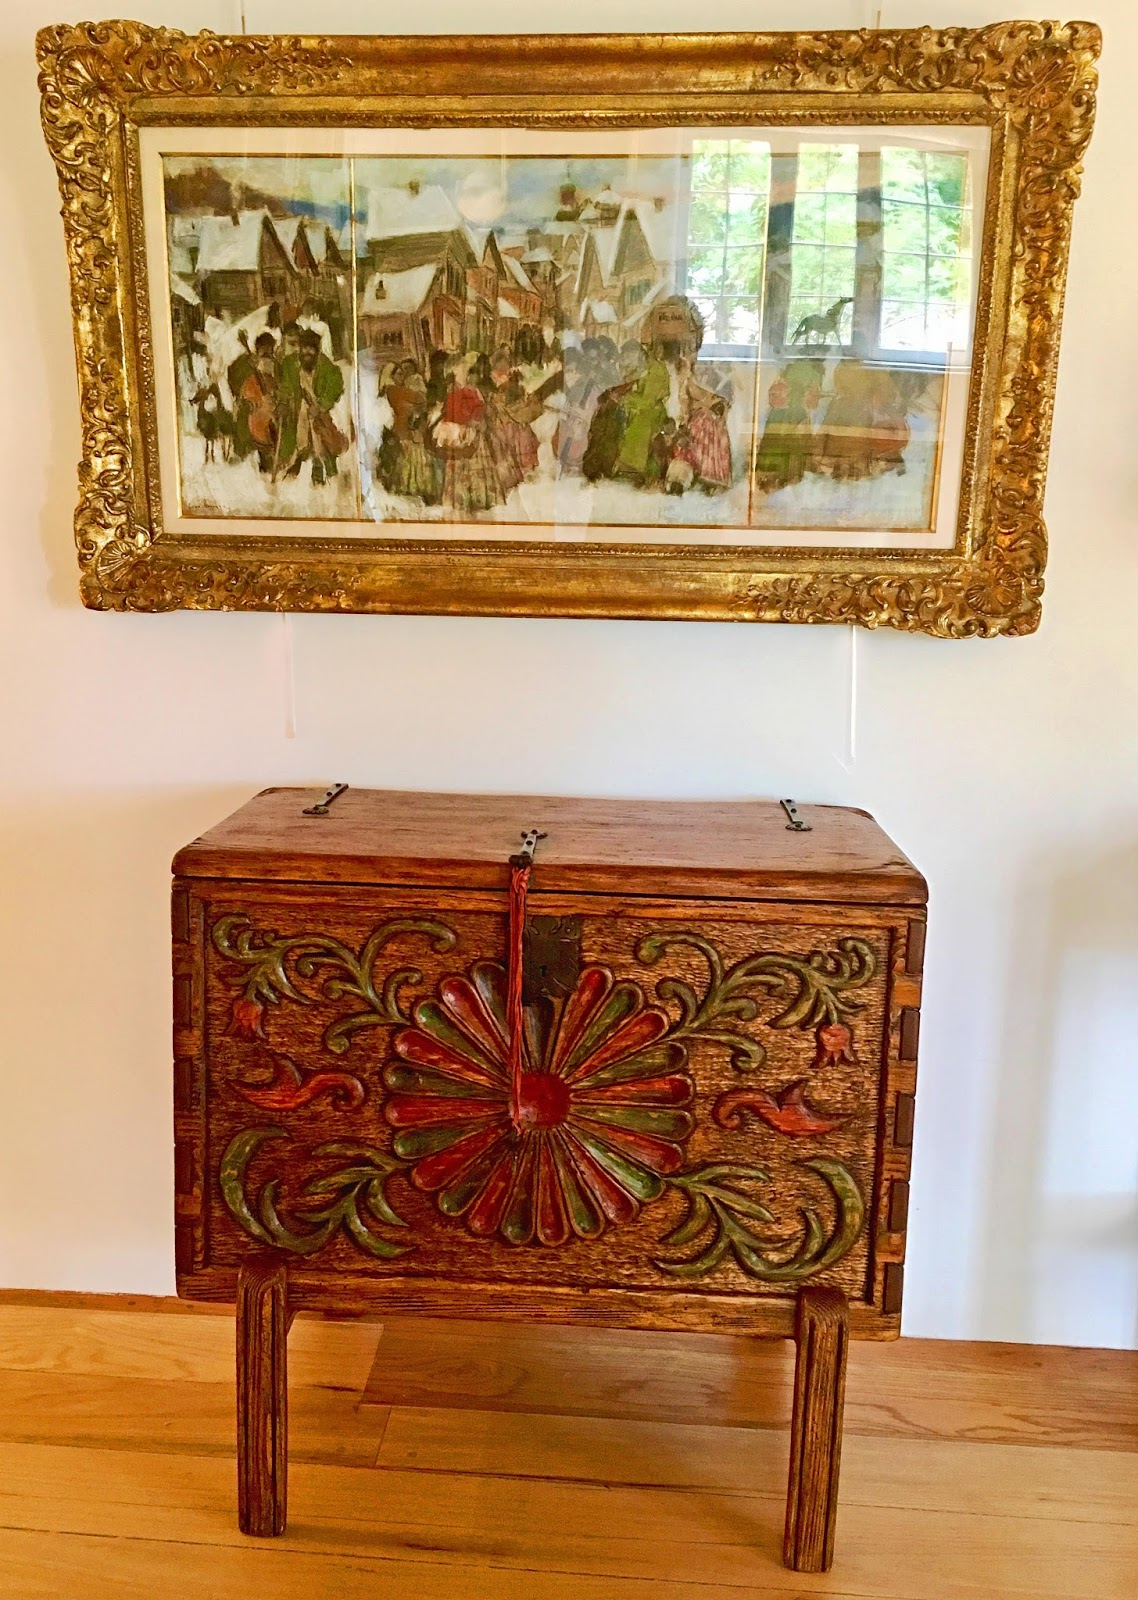 Chasing Santa Fe Anthony E Martinez A Master Craftsman